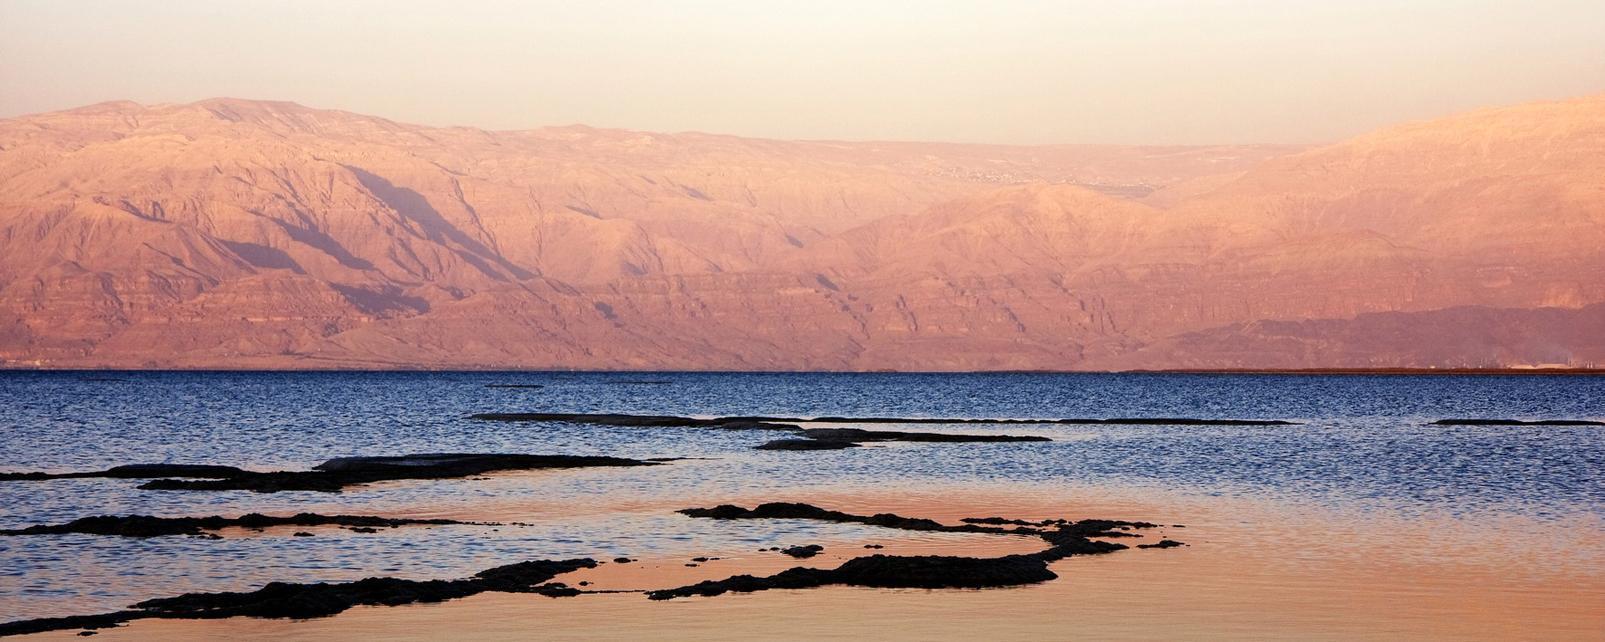 Moyen-Orient; Jordanie; Suweimah;